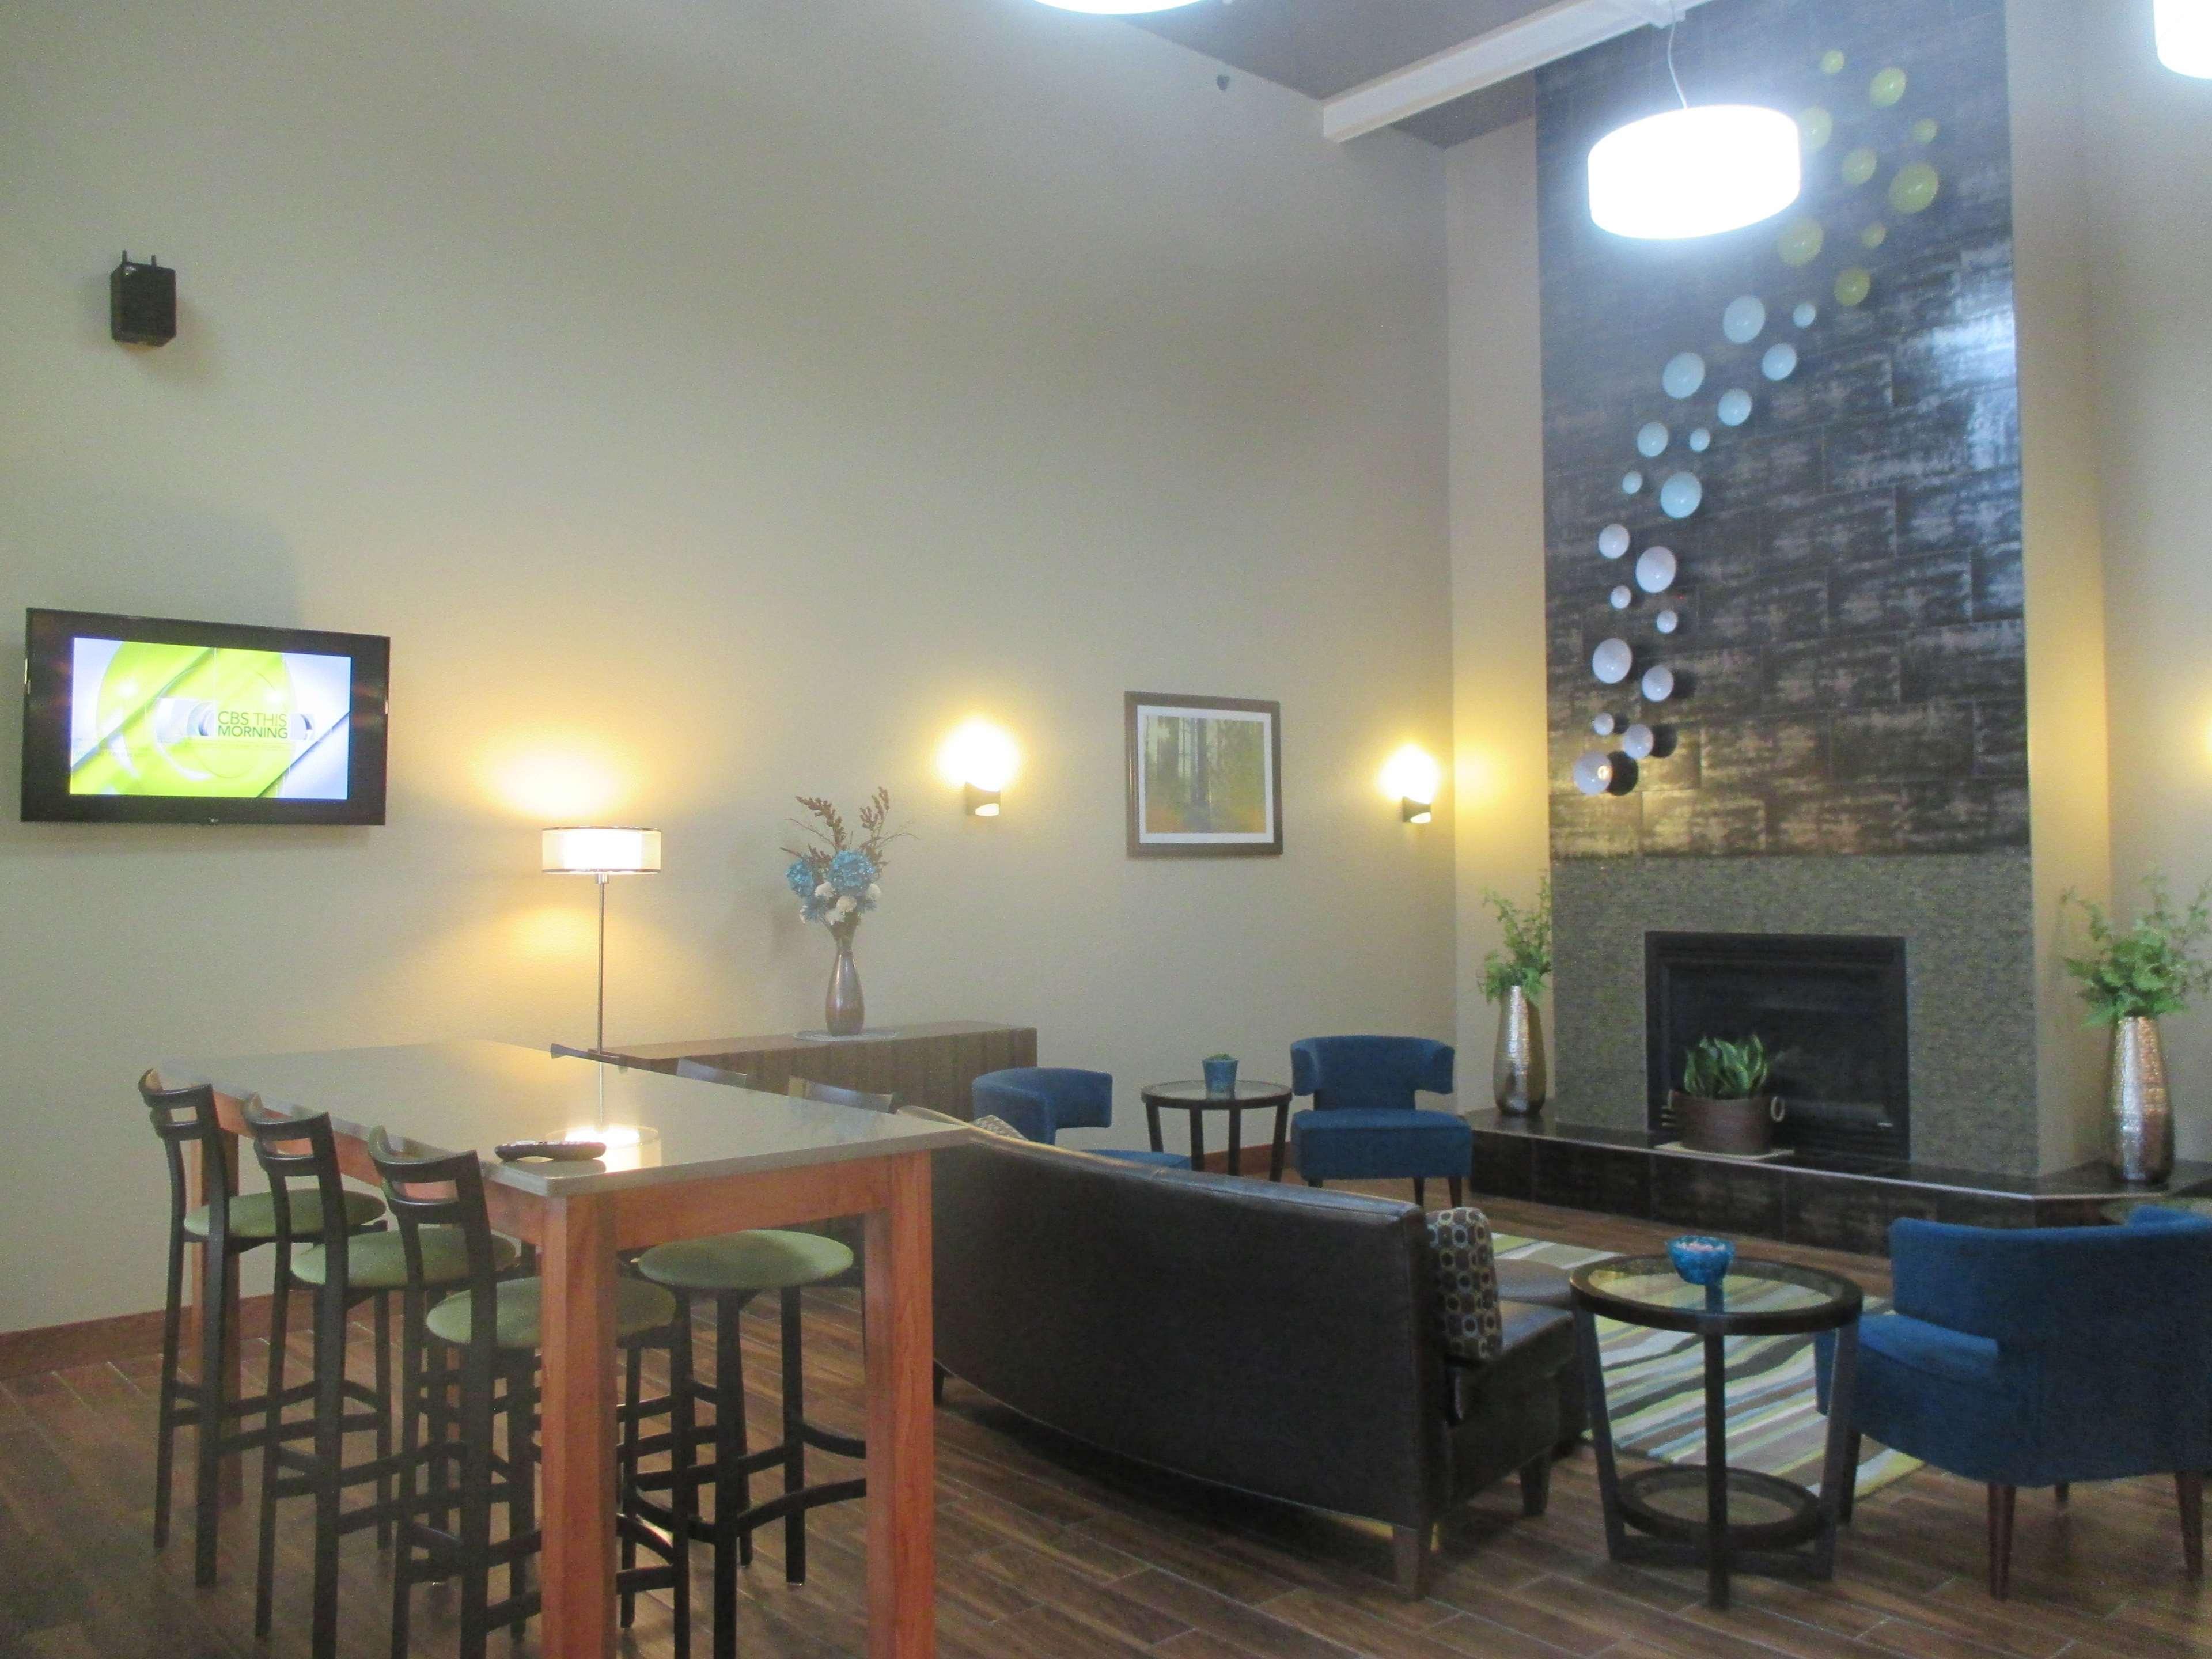 Hotels In Menomonie Wi Near Uw Stout